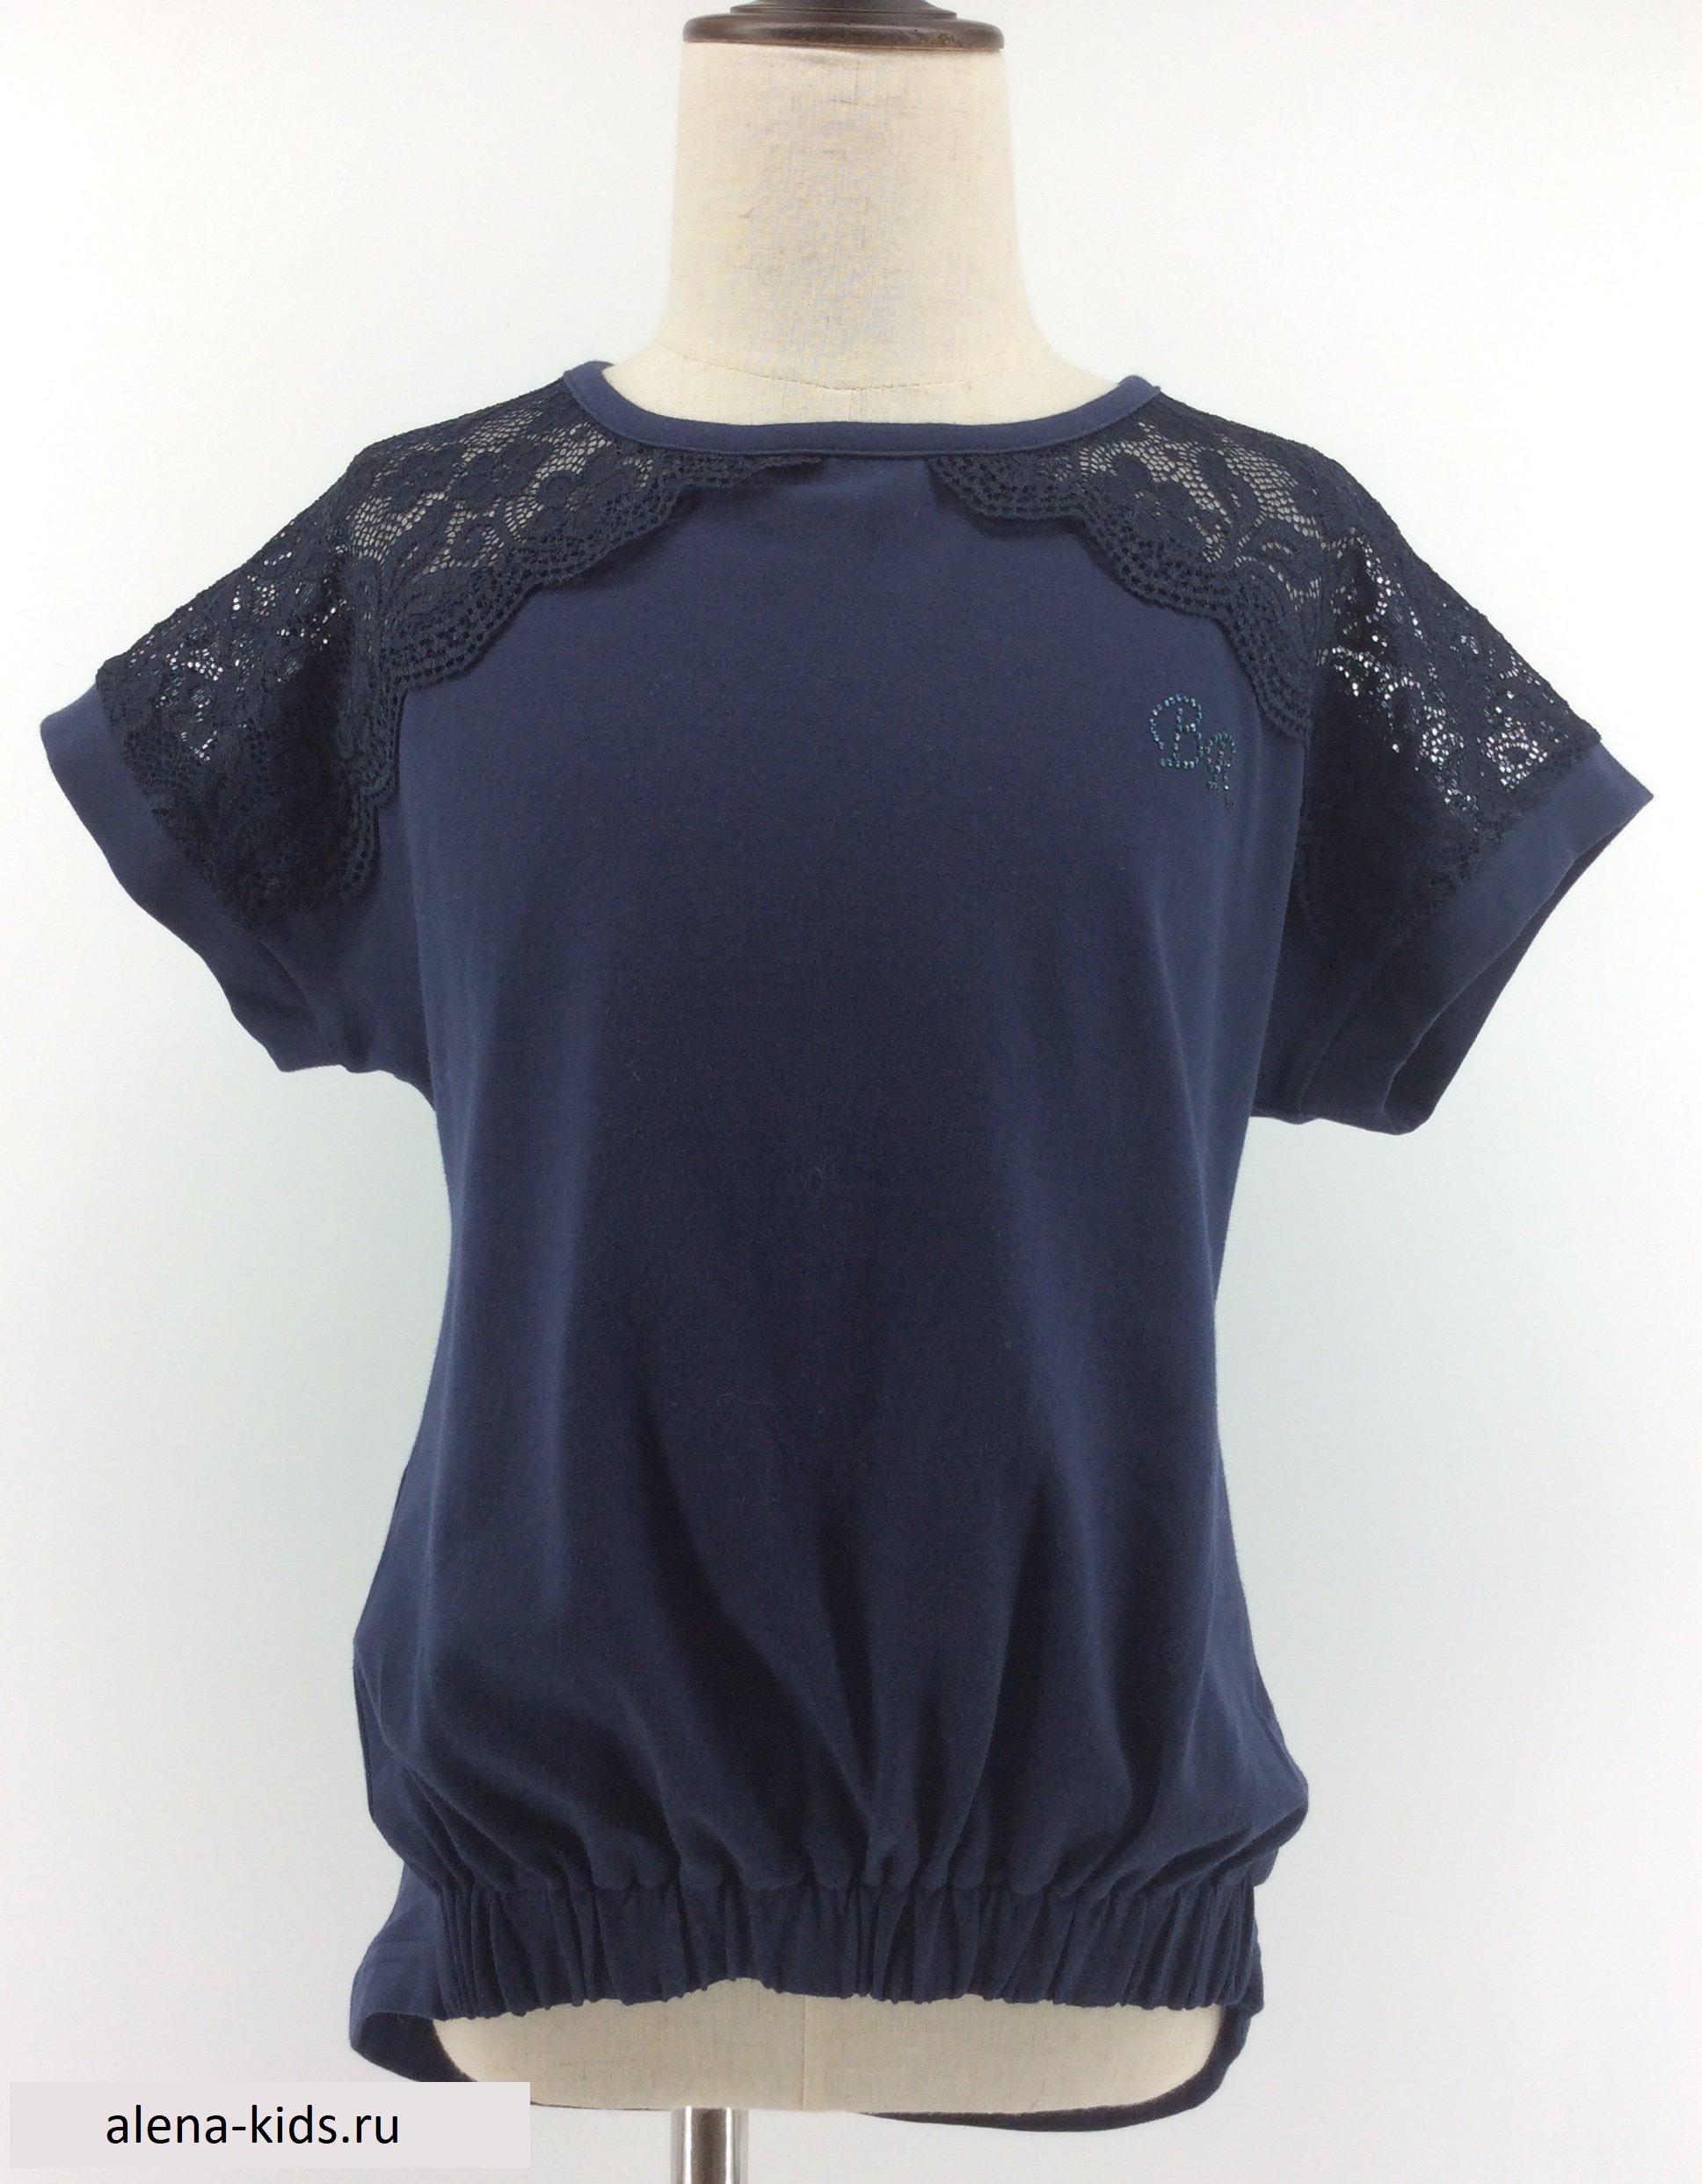 Блузка для девочки YGBH561352